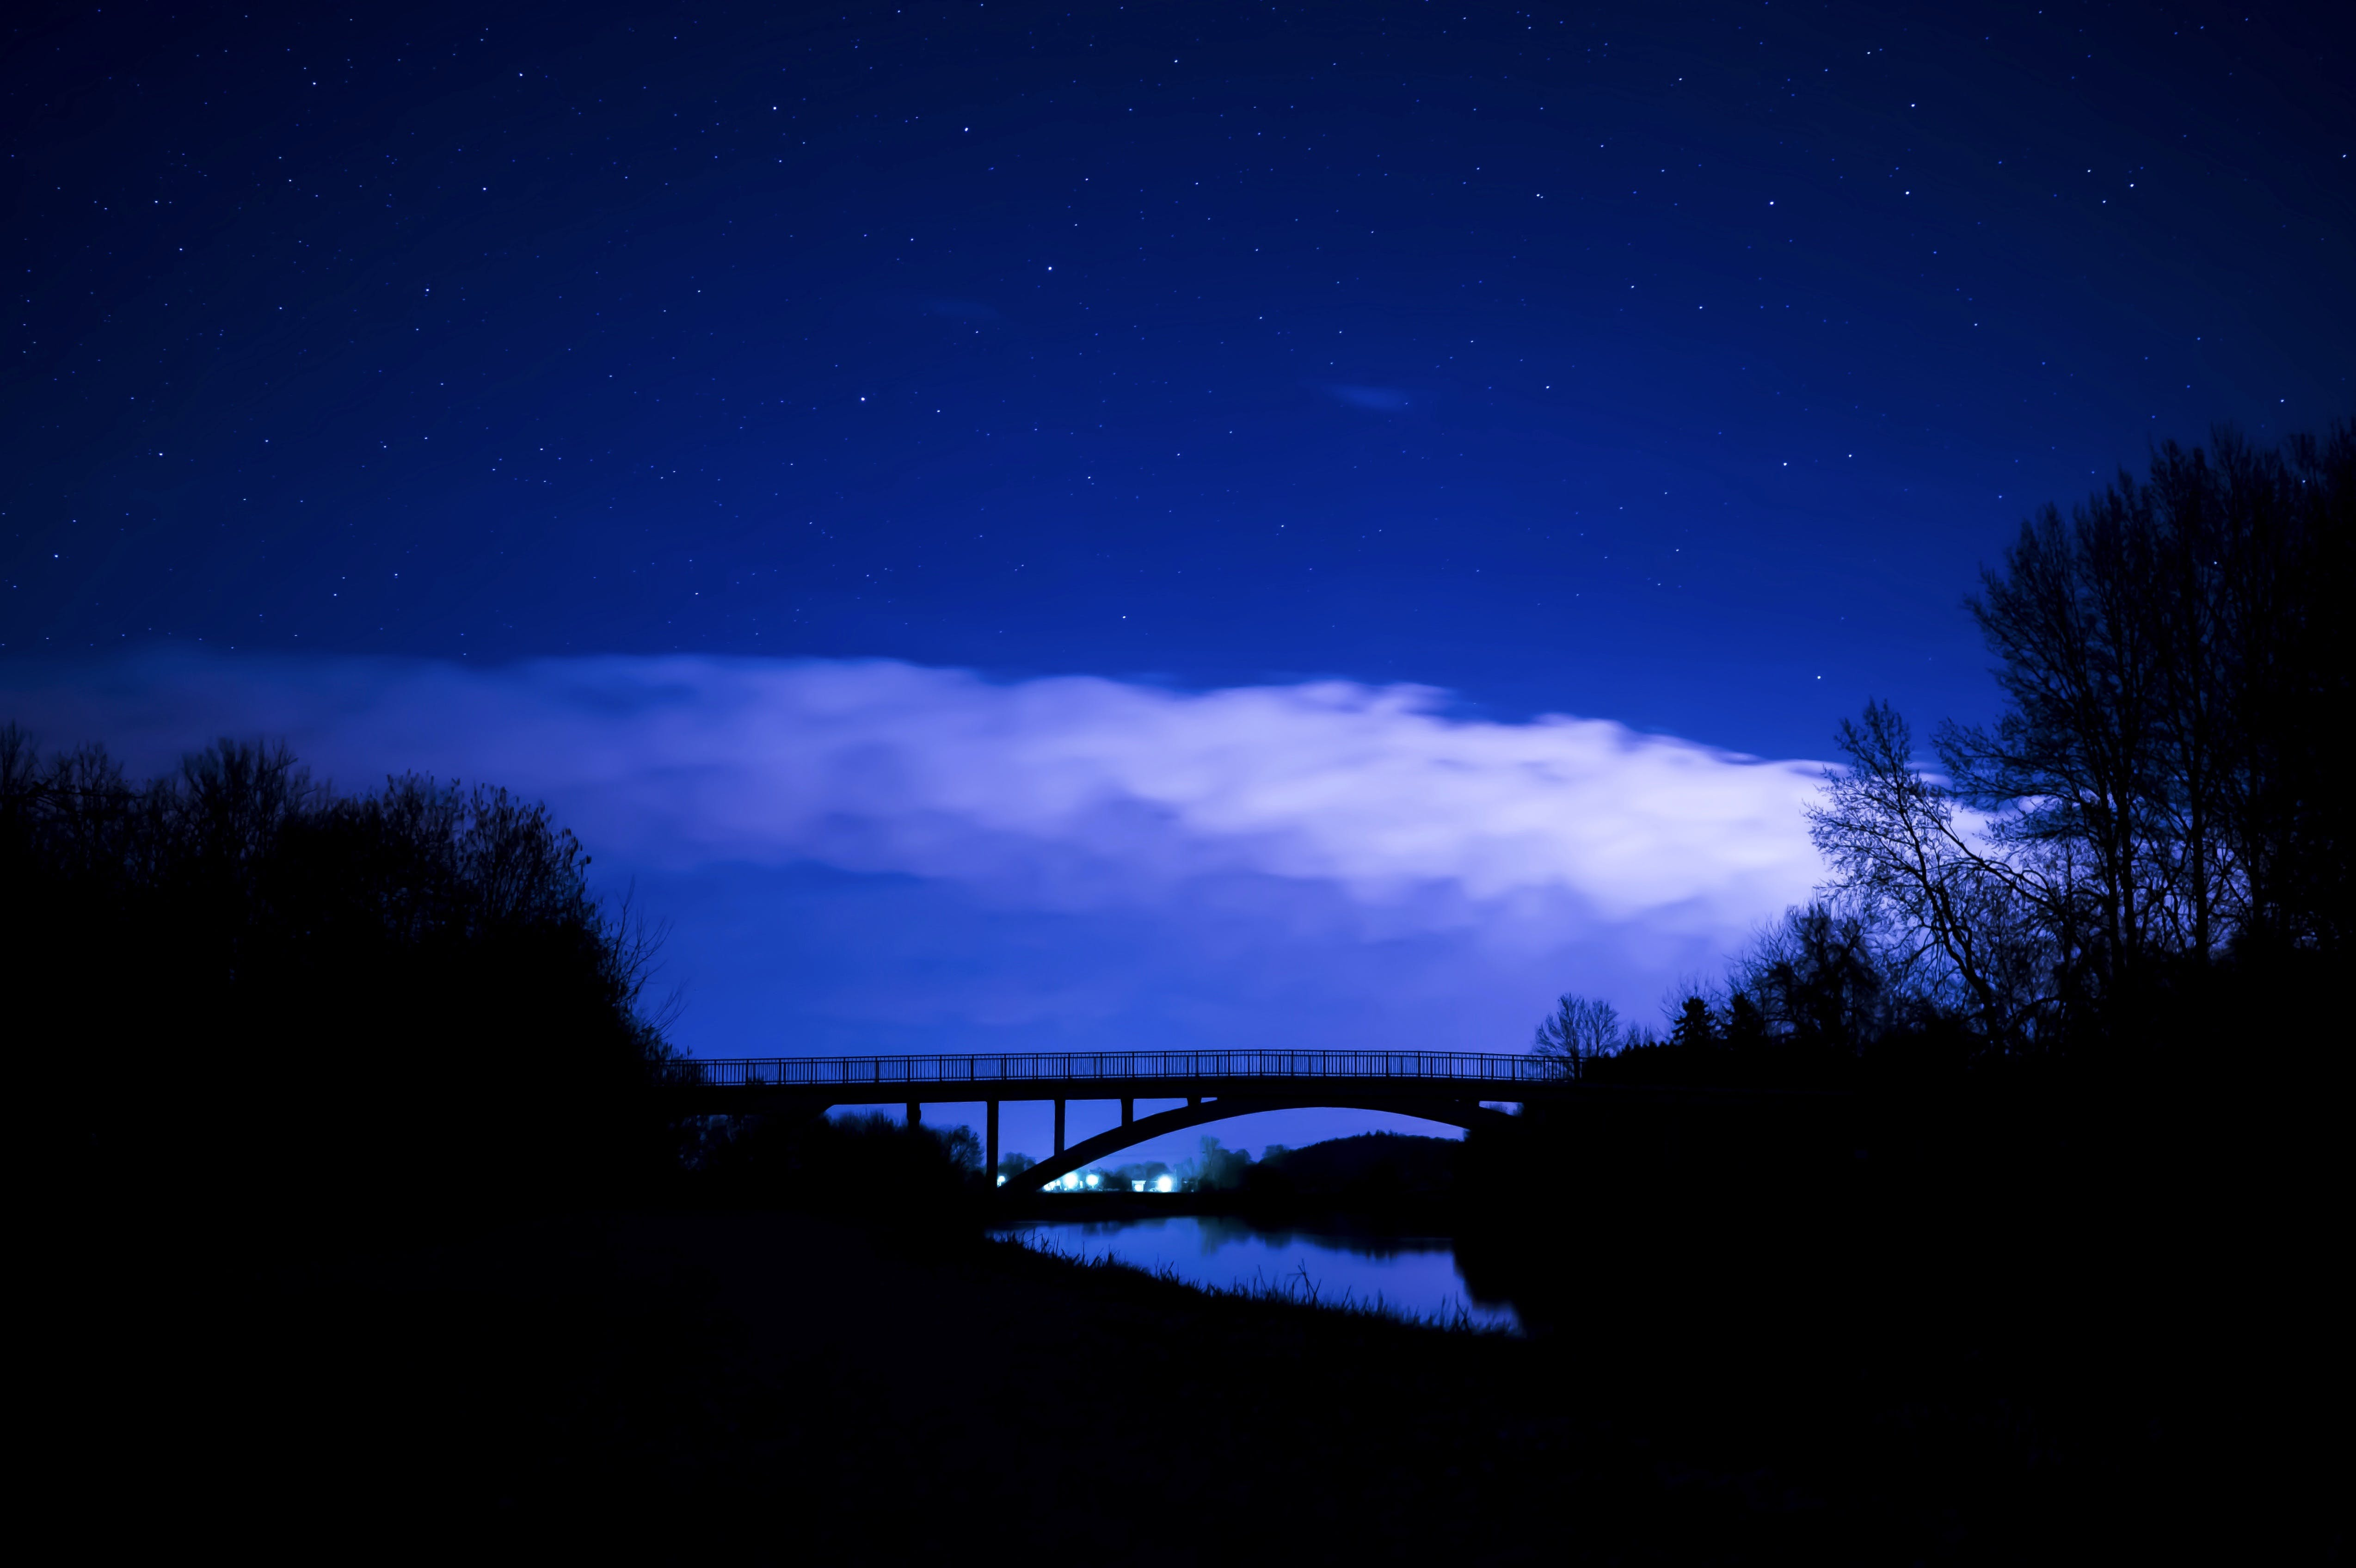 Silhouette Photo of Truss Bridge